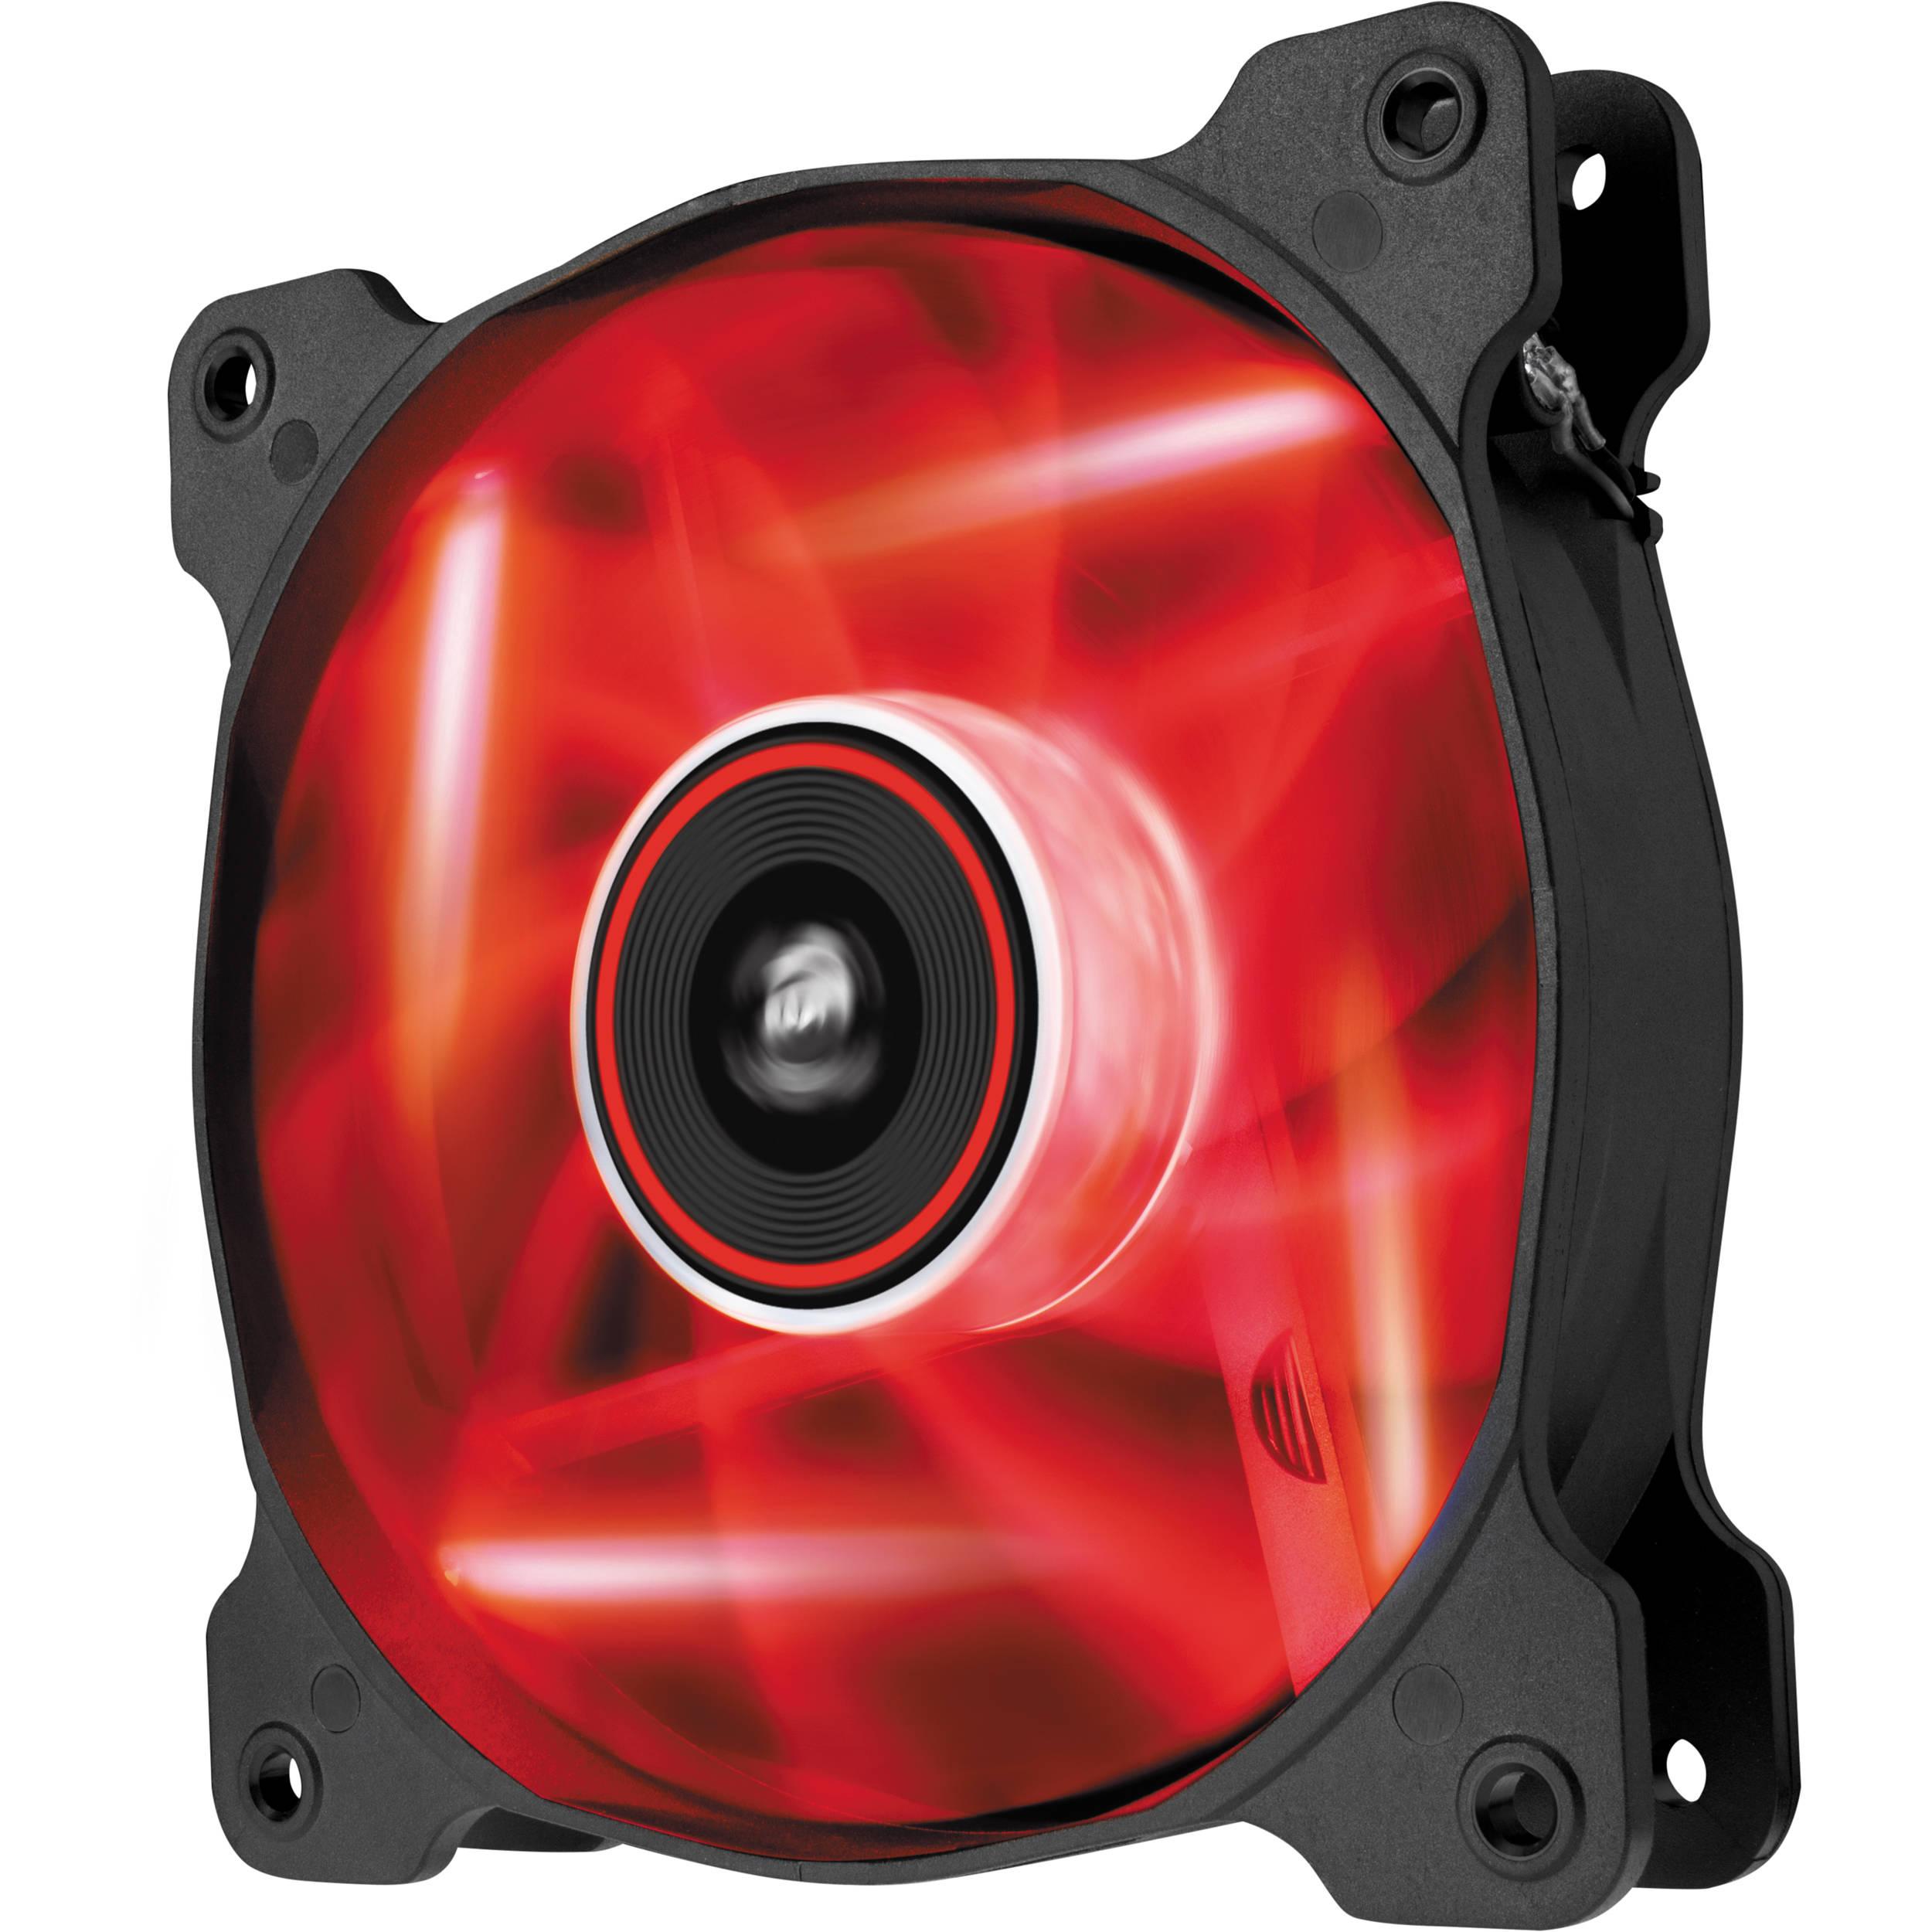 Corsair Air Series SP120 LED Red High Static Pressure 120mm Fan #B31822